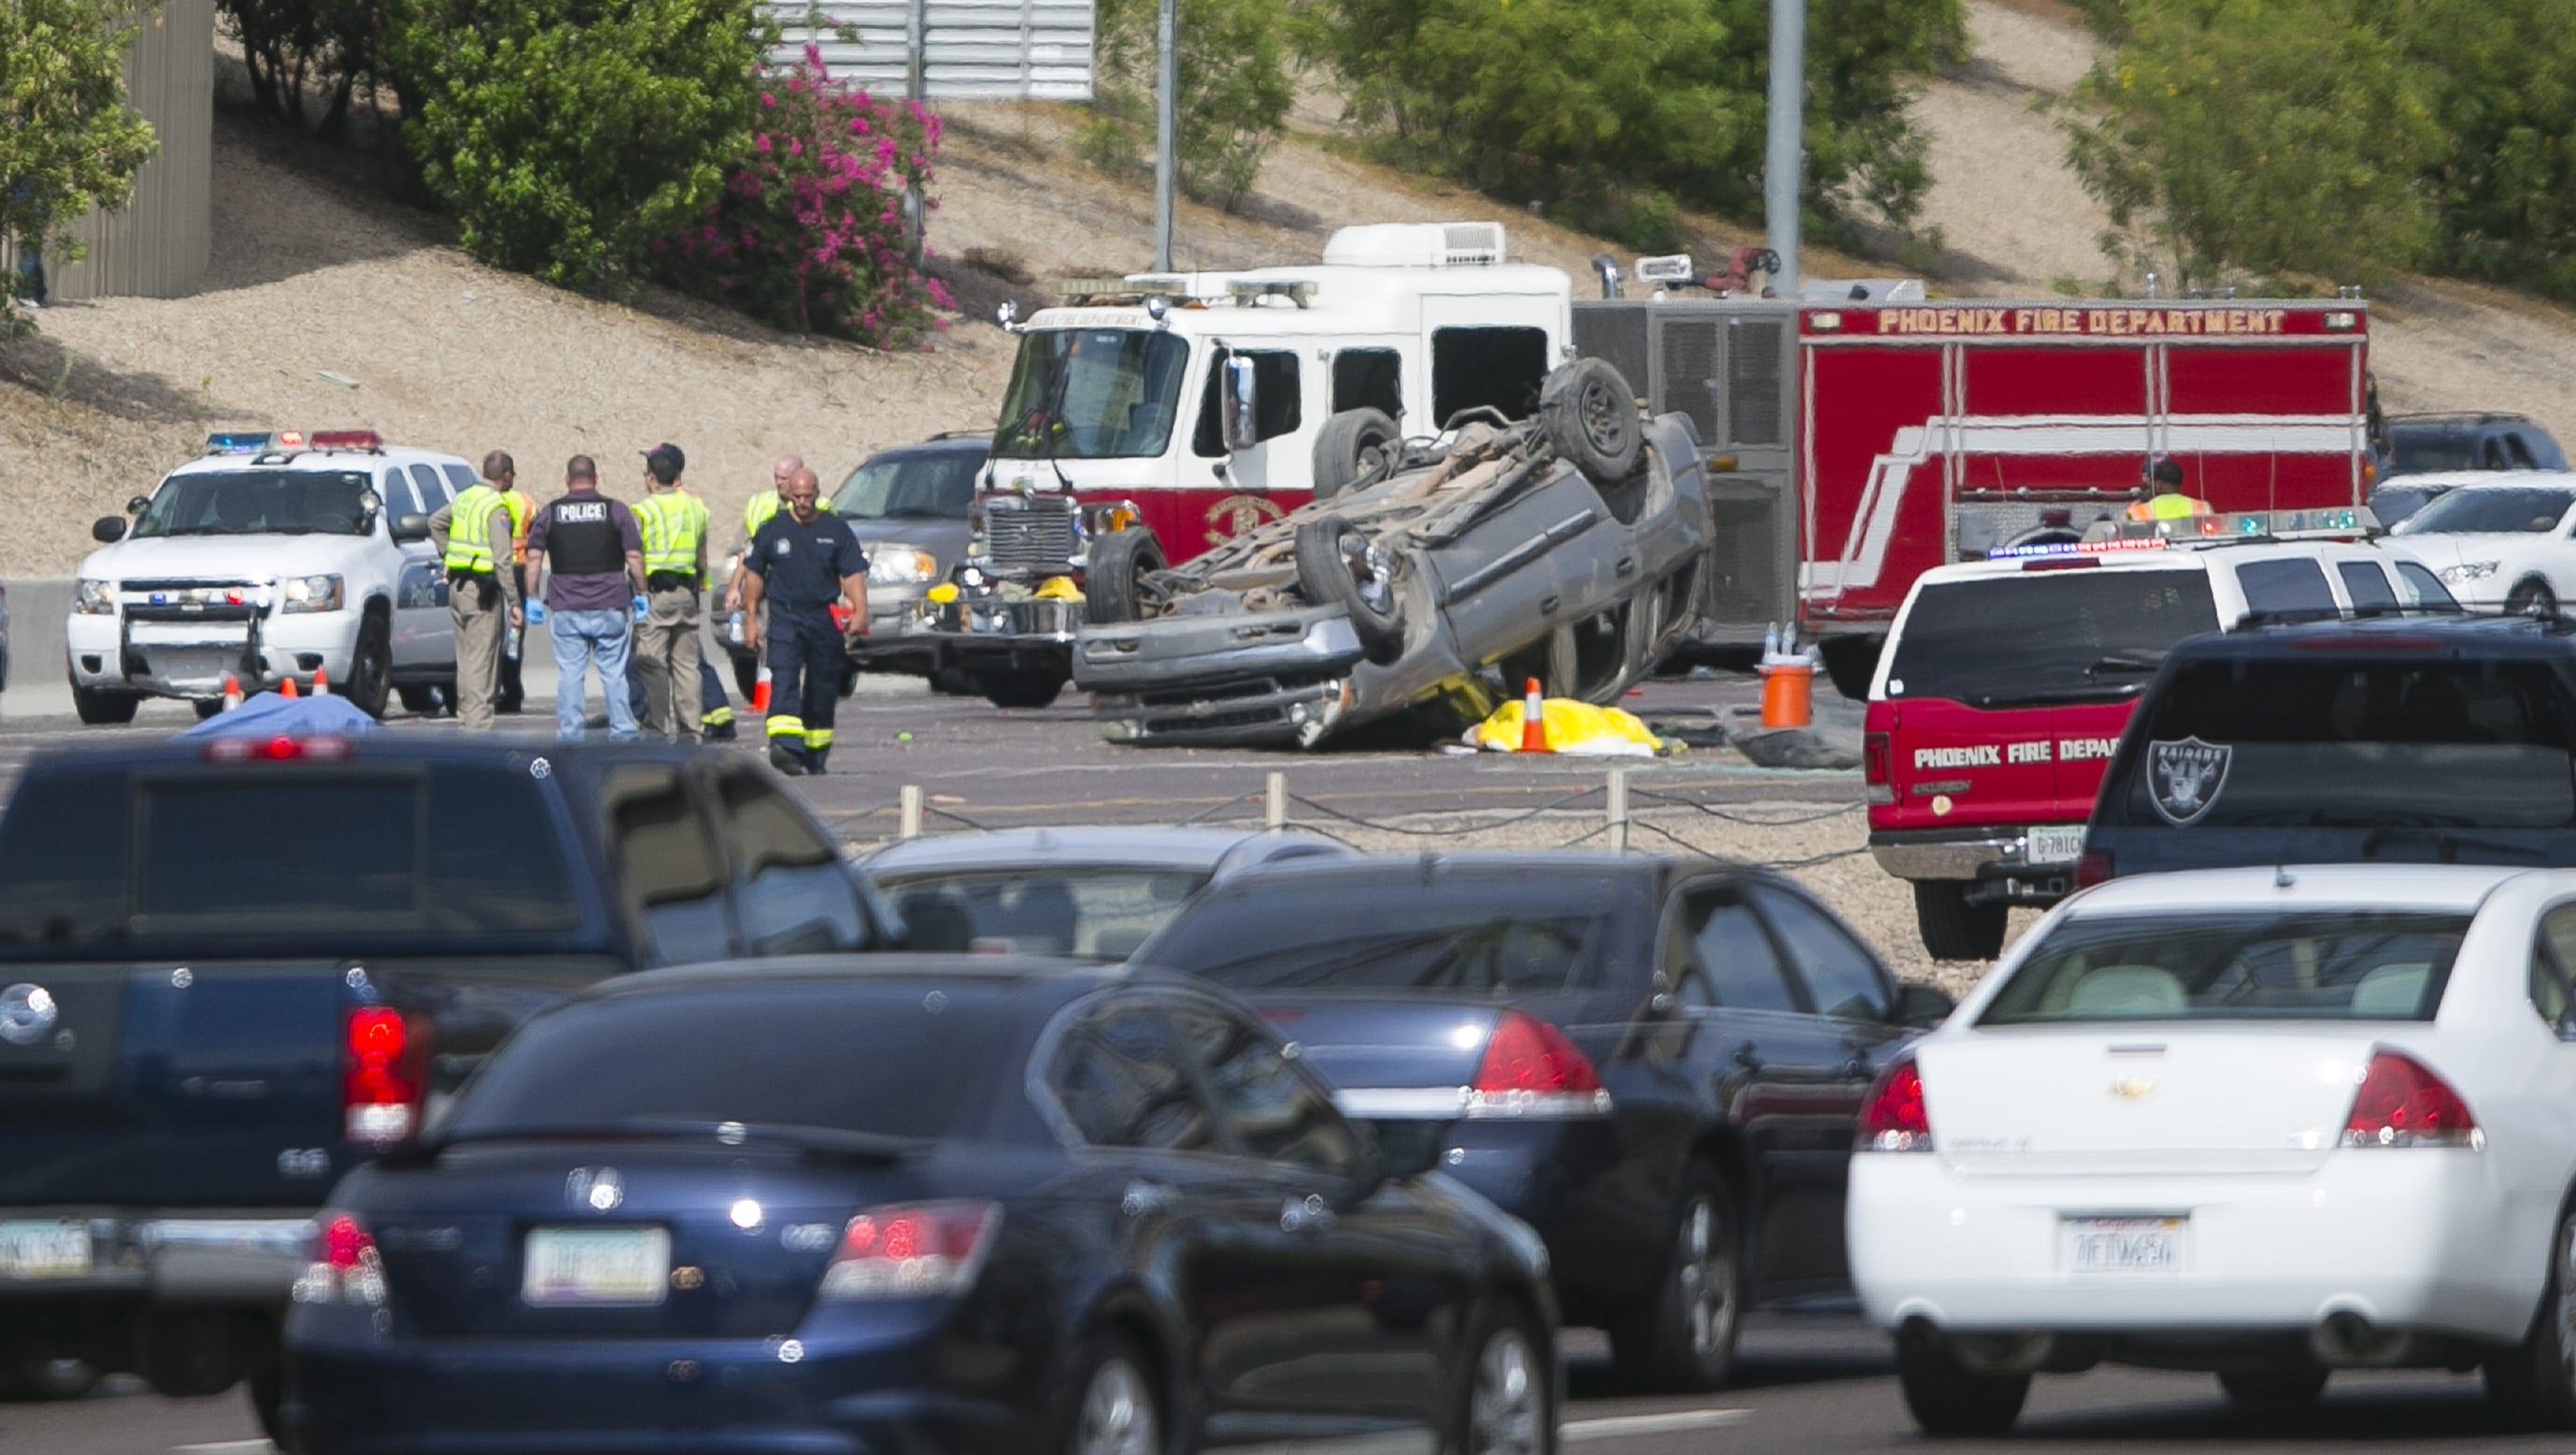 car accident phoenix today  None wearing seatbelts in triple fatal Phoenix crash on I-10 ...